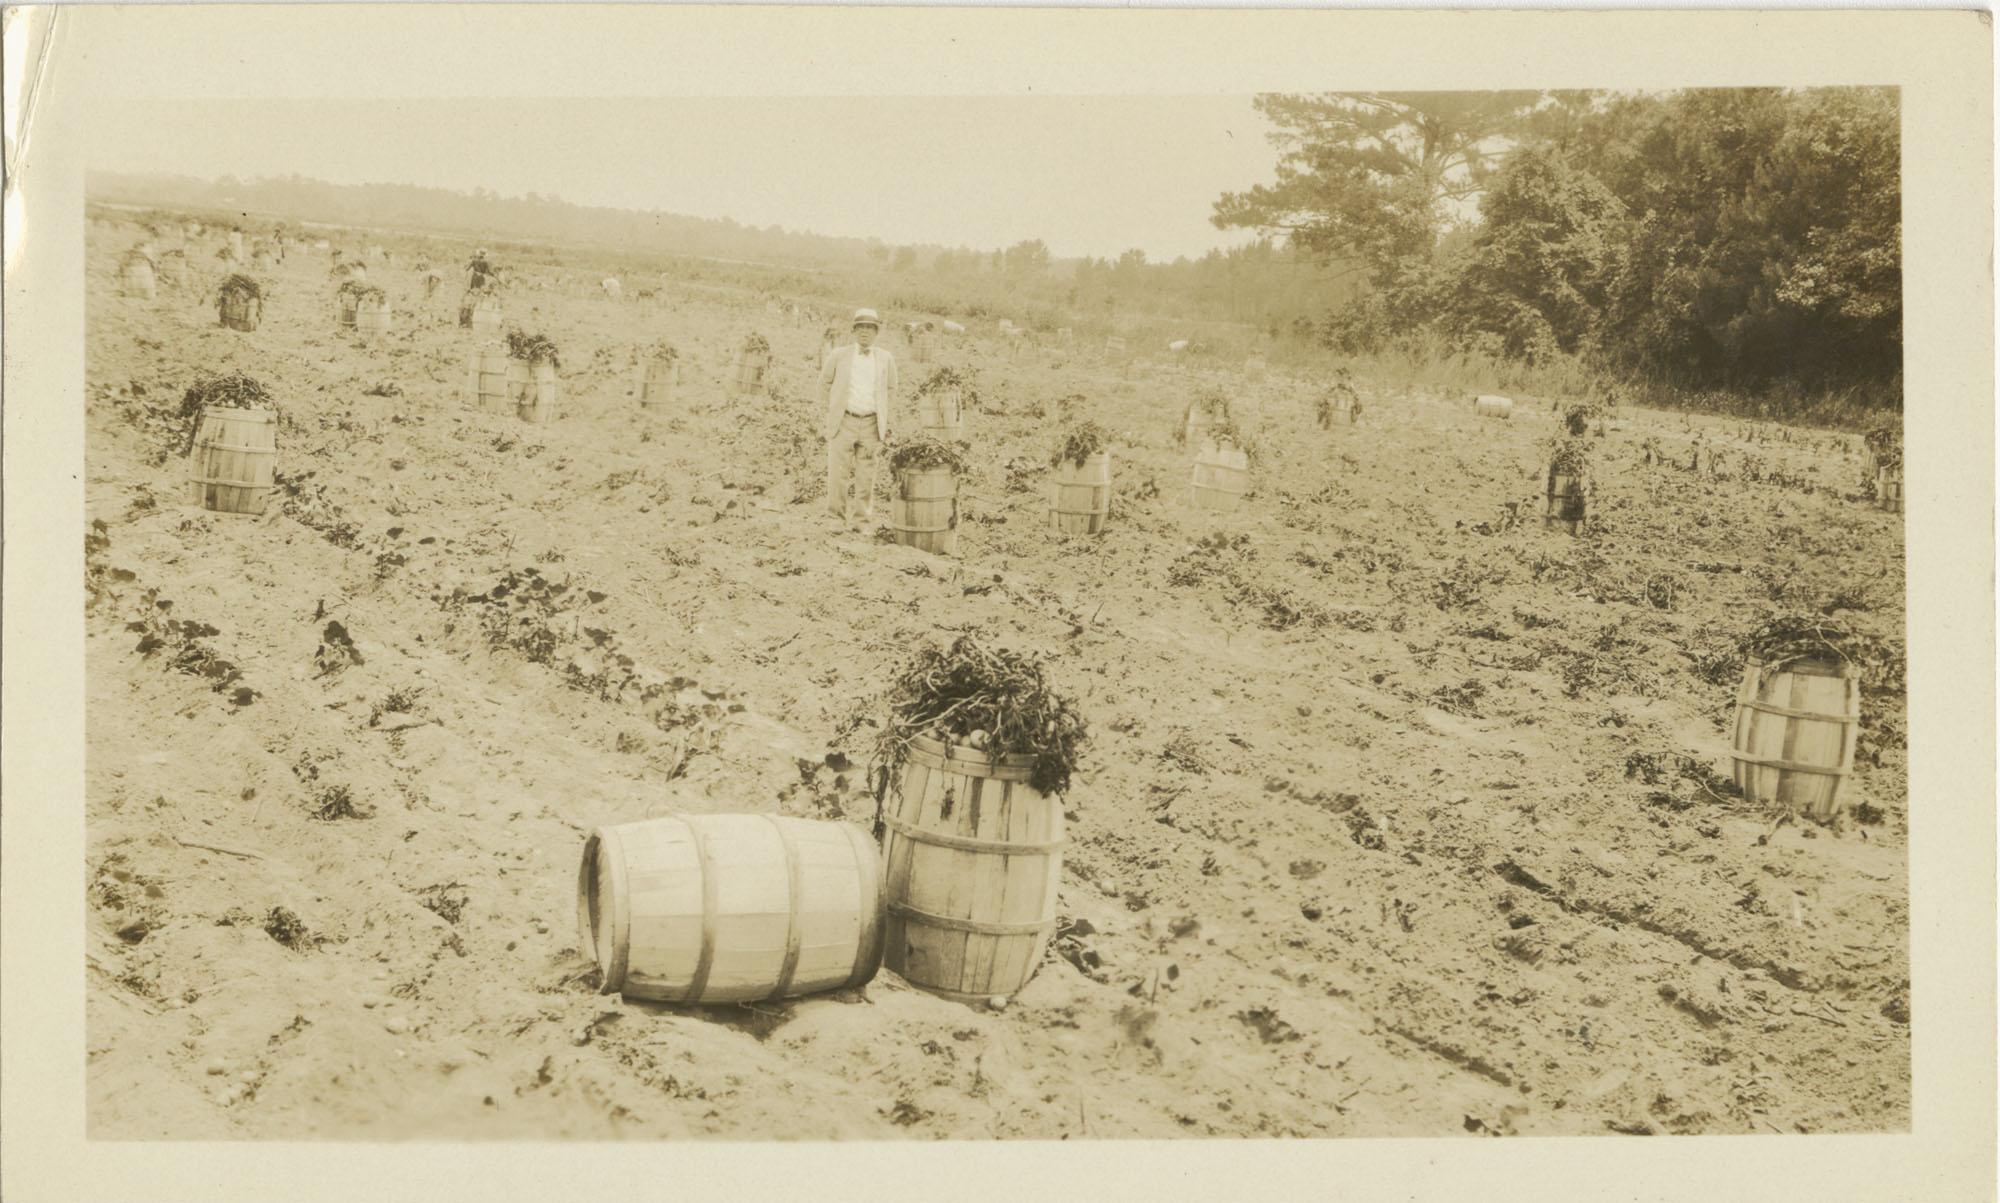 Businessman Standing in Potato Field